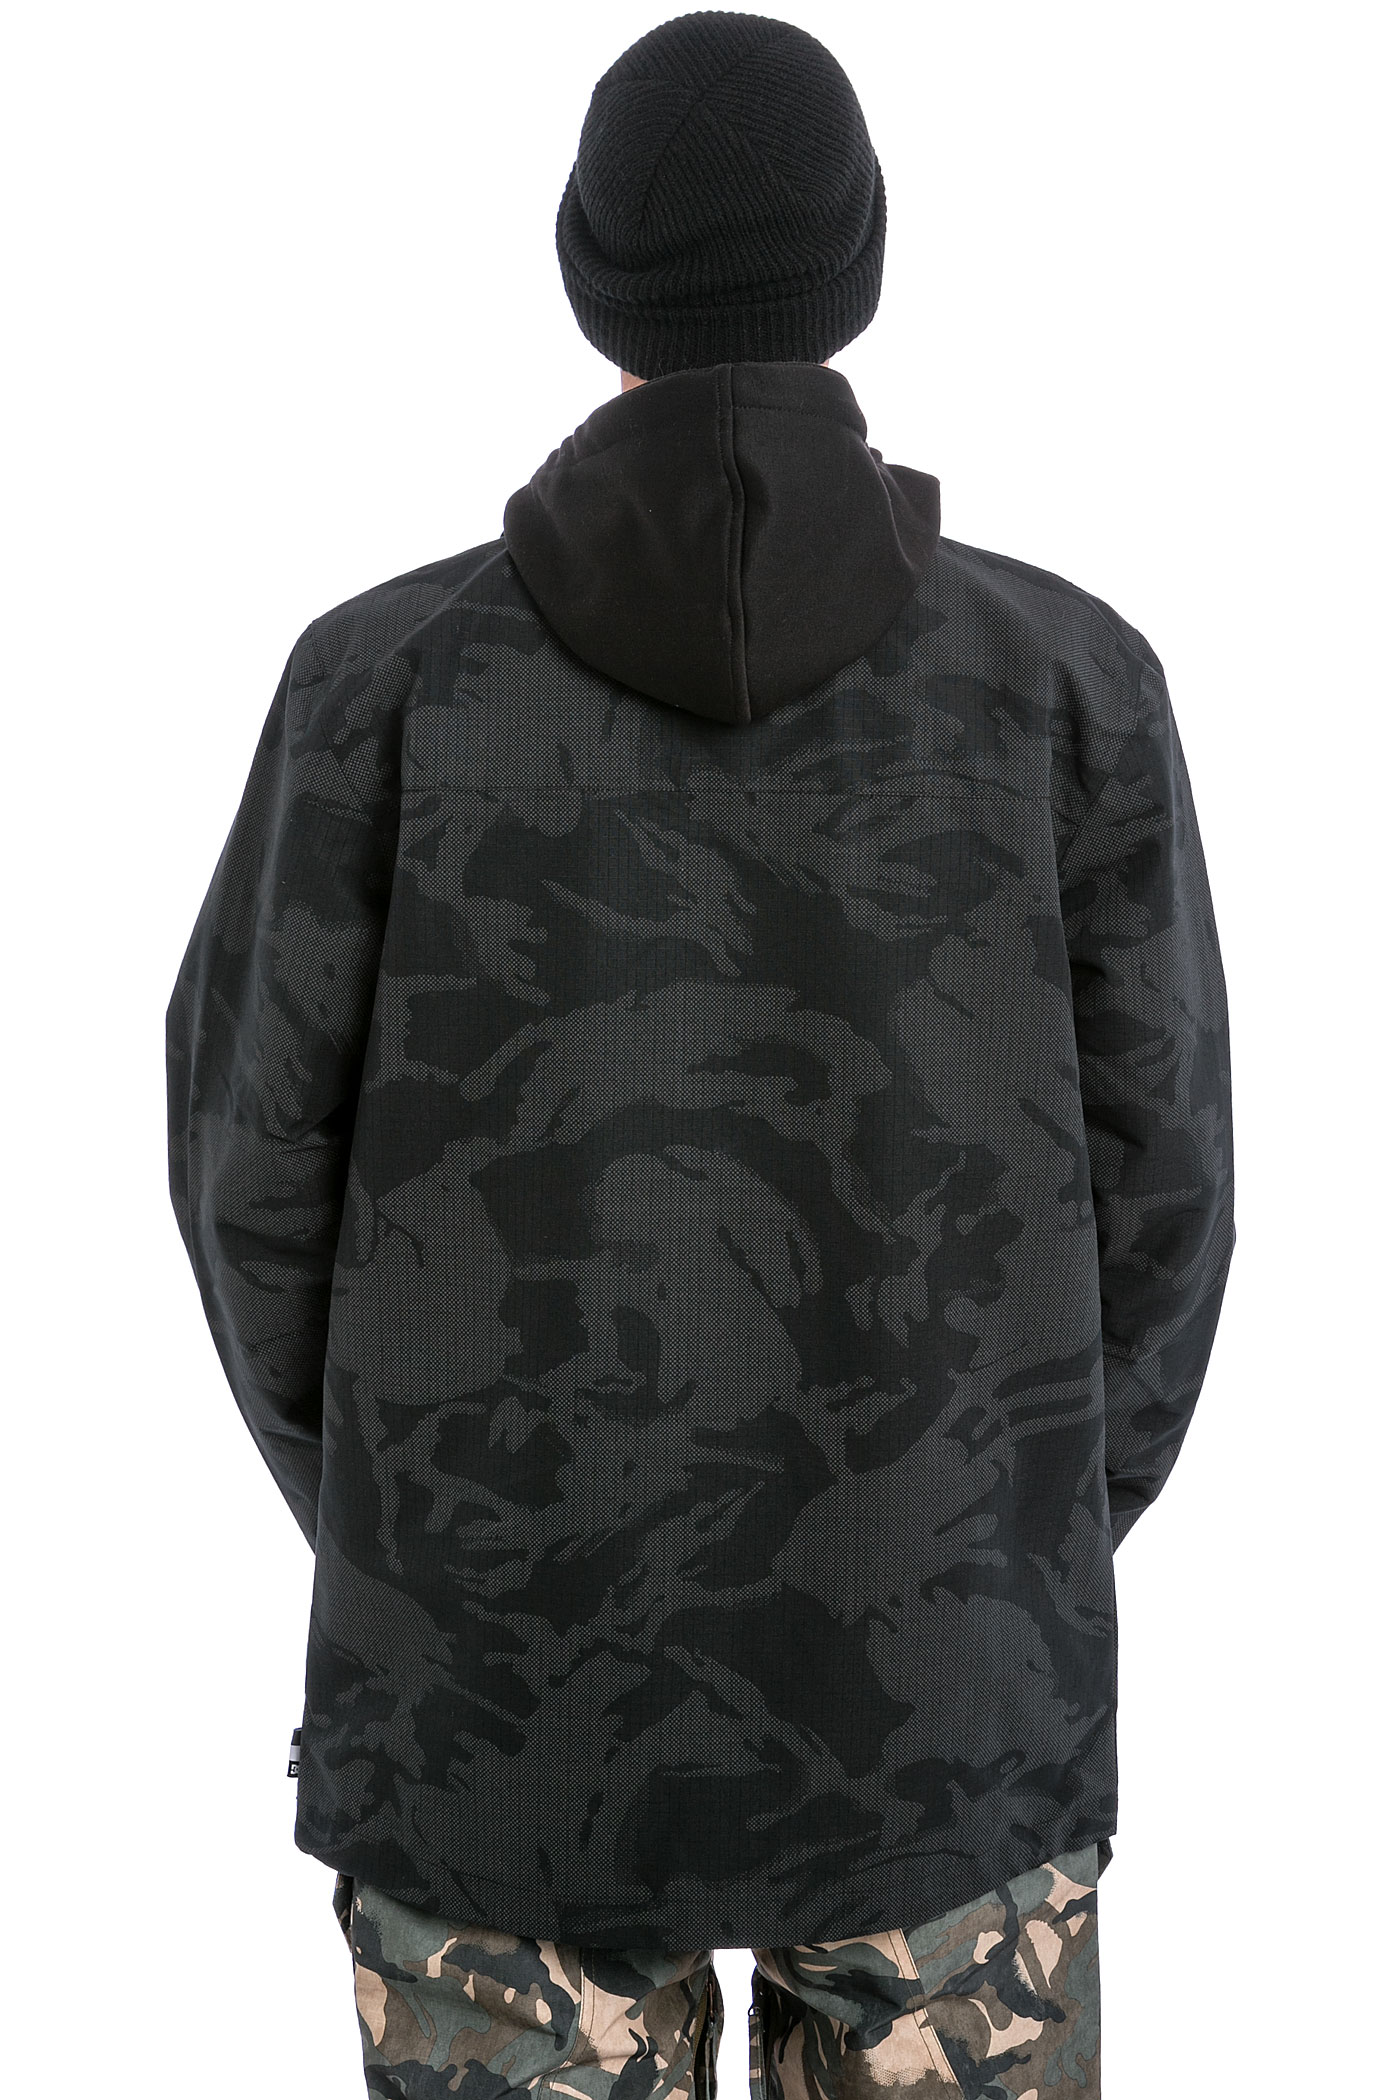 Dc camo snowboard jacket